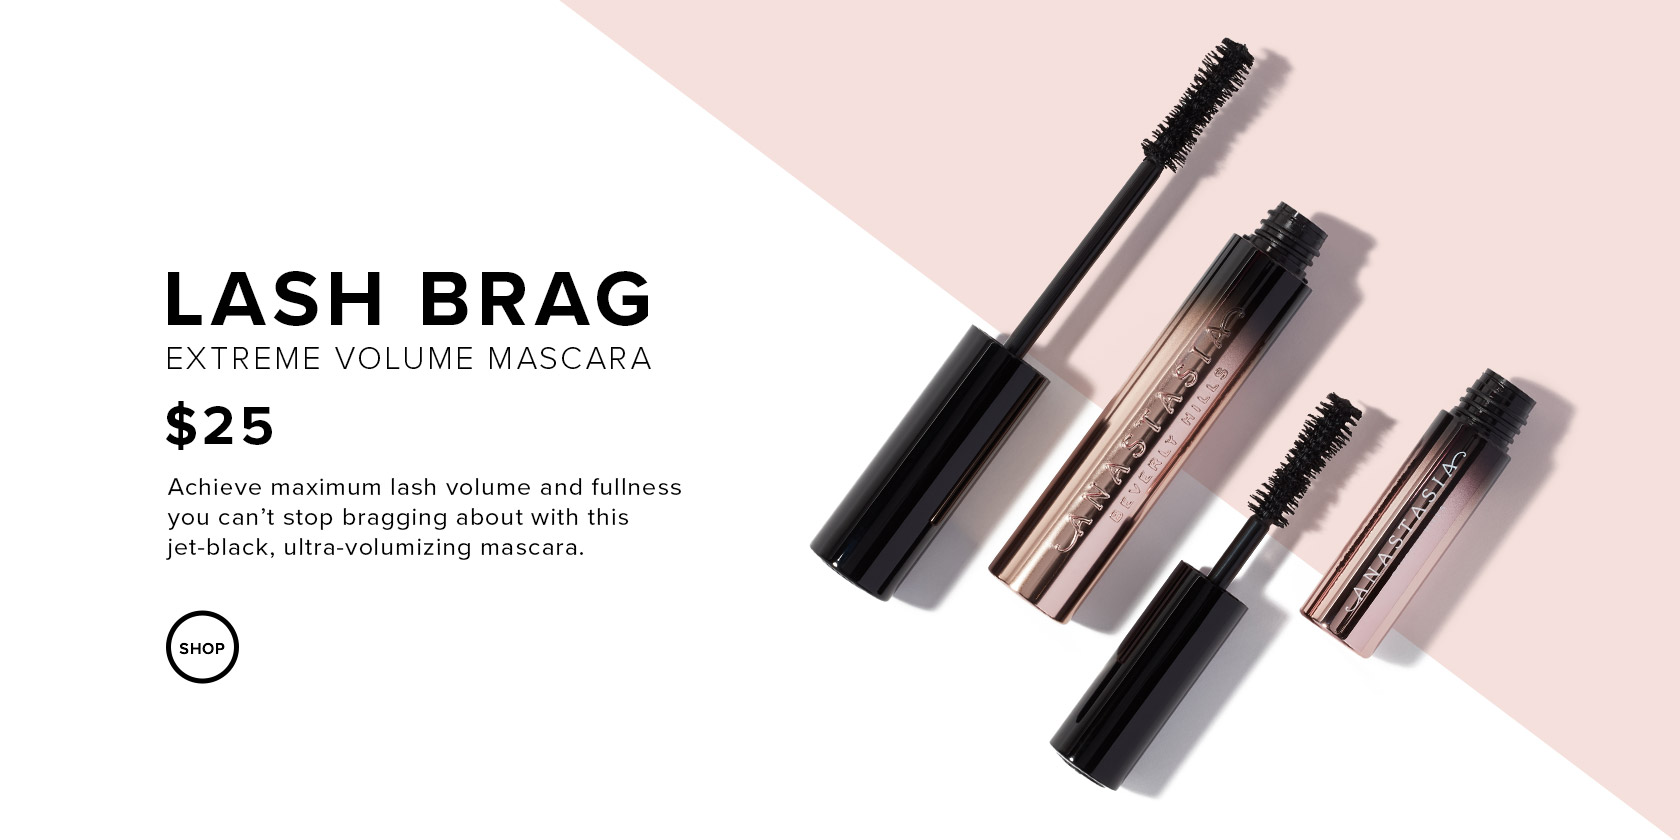 Lash Brag Mascara - Extreme Volume Mascara